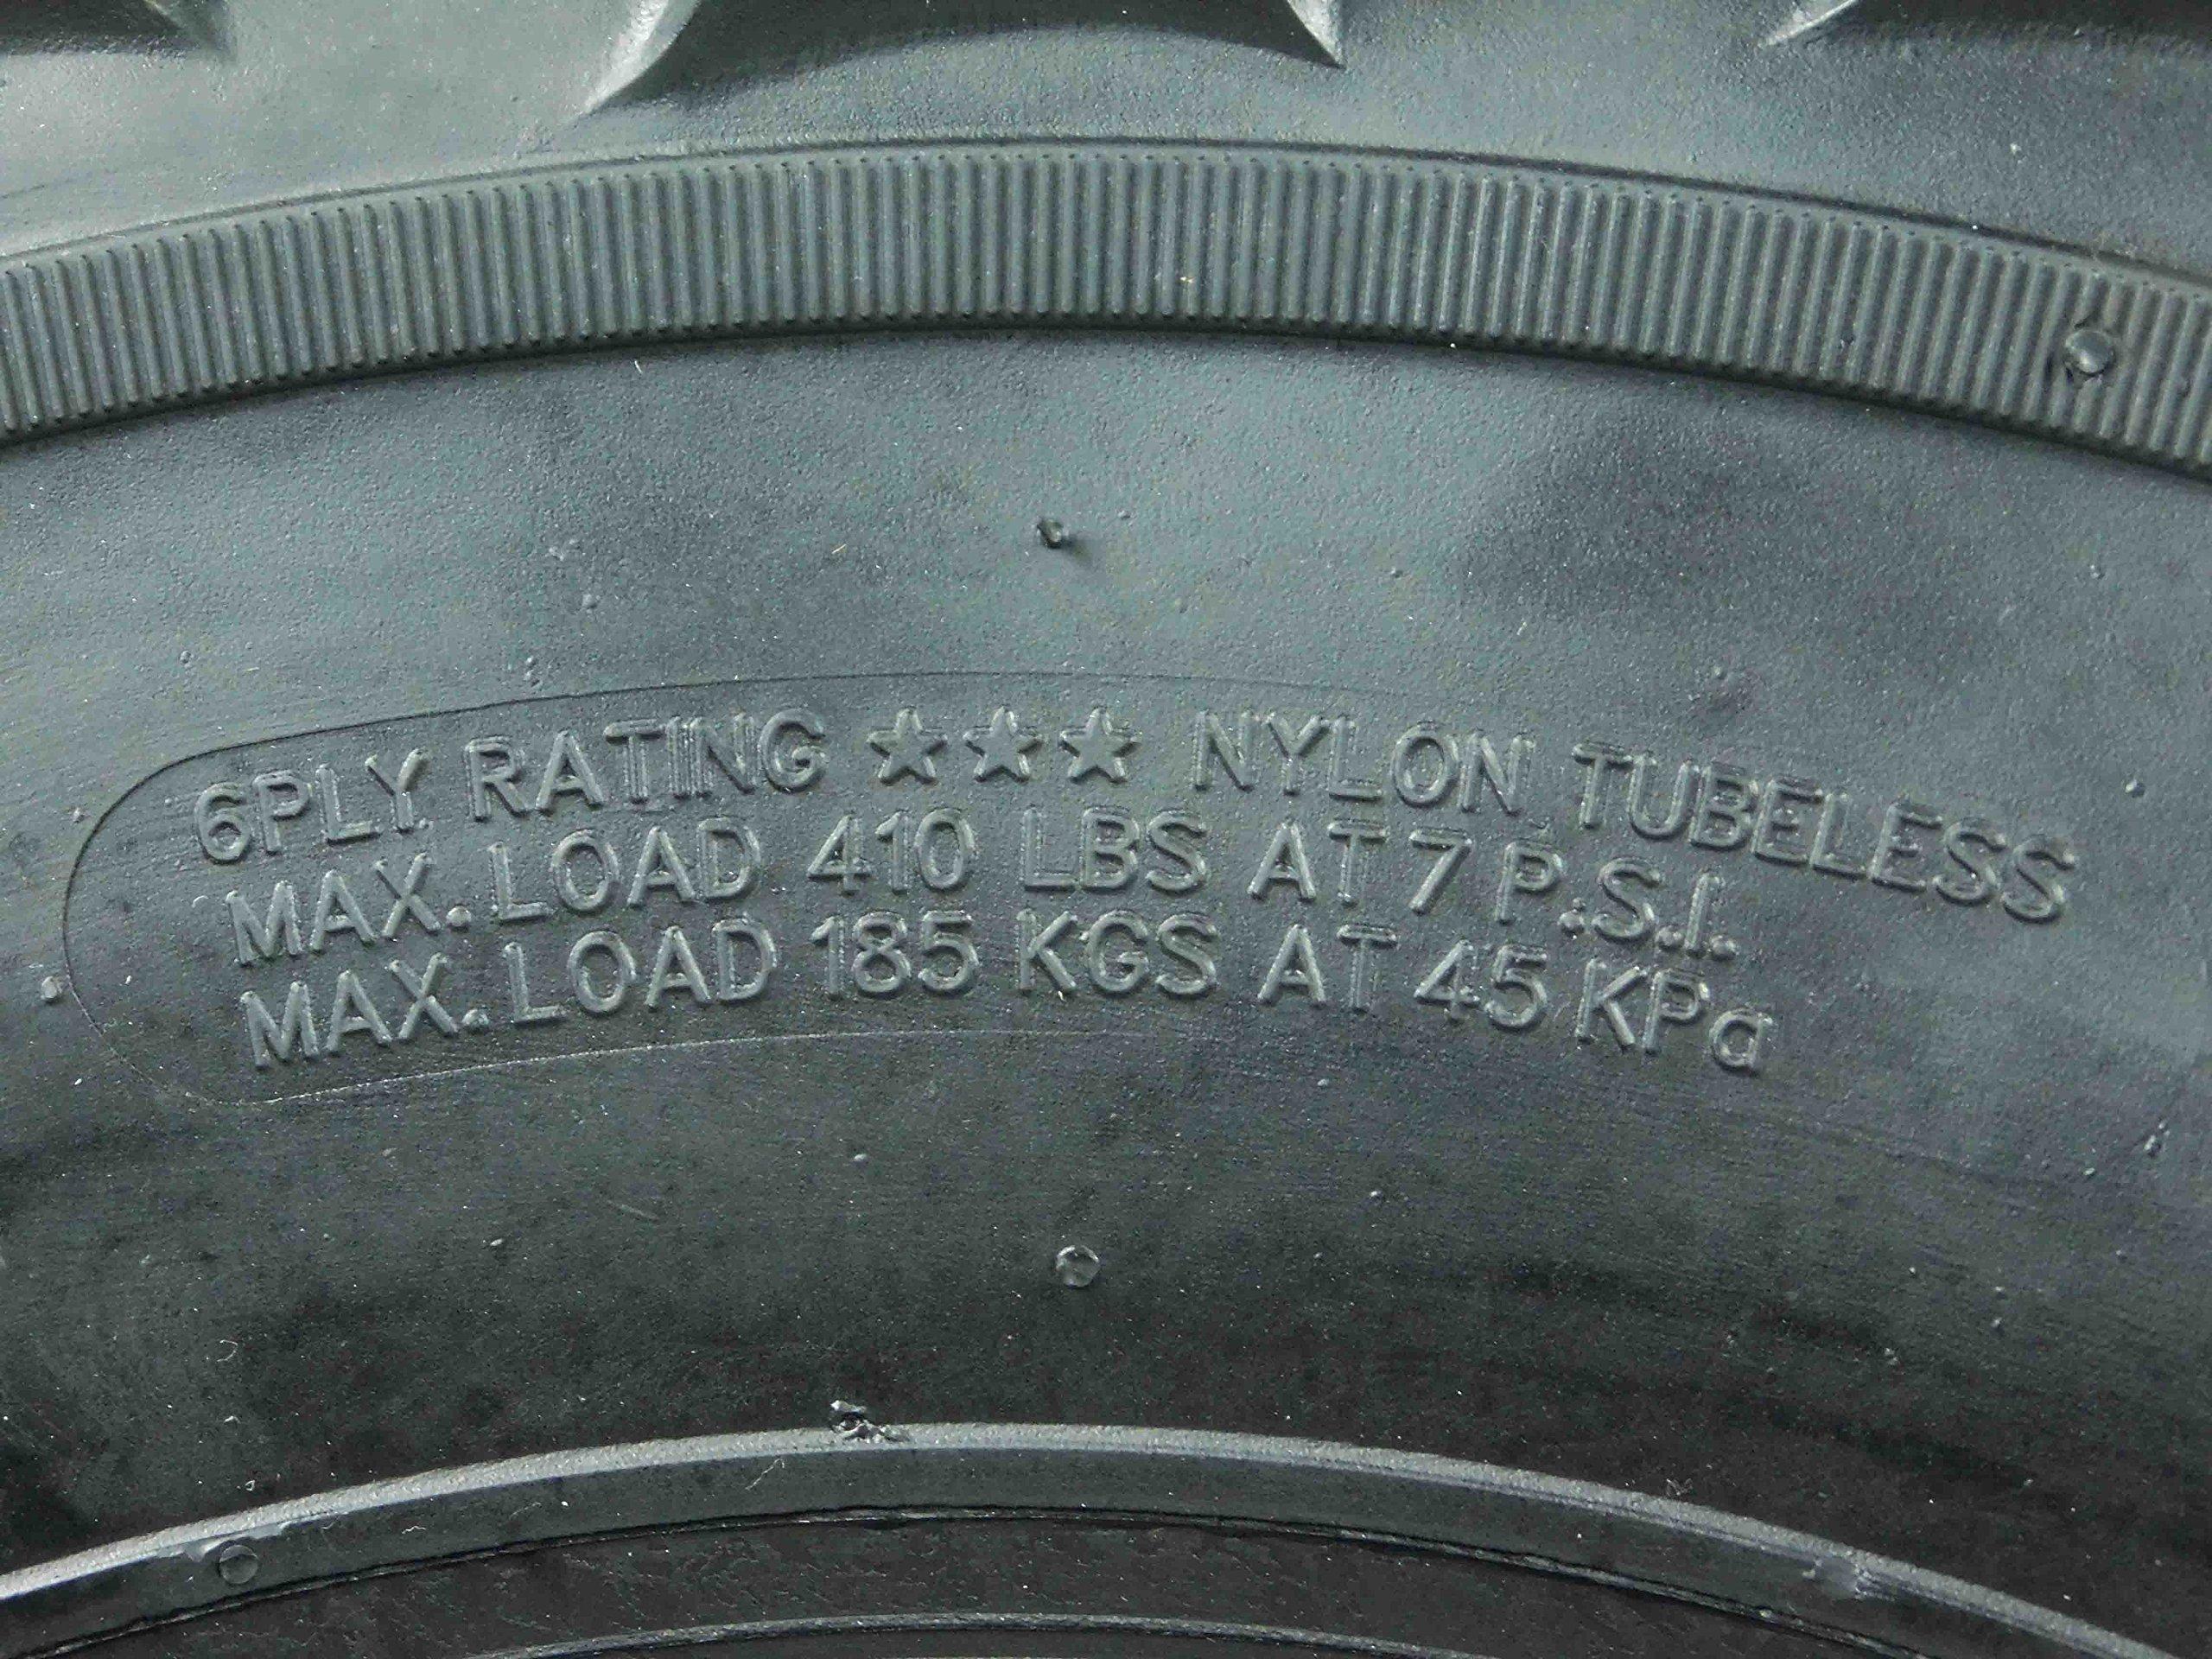 New Single MASSFX MS ATV/UTV Tire 26 x9-12 Front, 26x9x12 26x9/12 by MASSFX (Image #3)